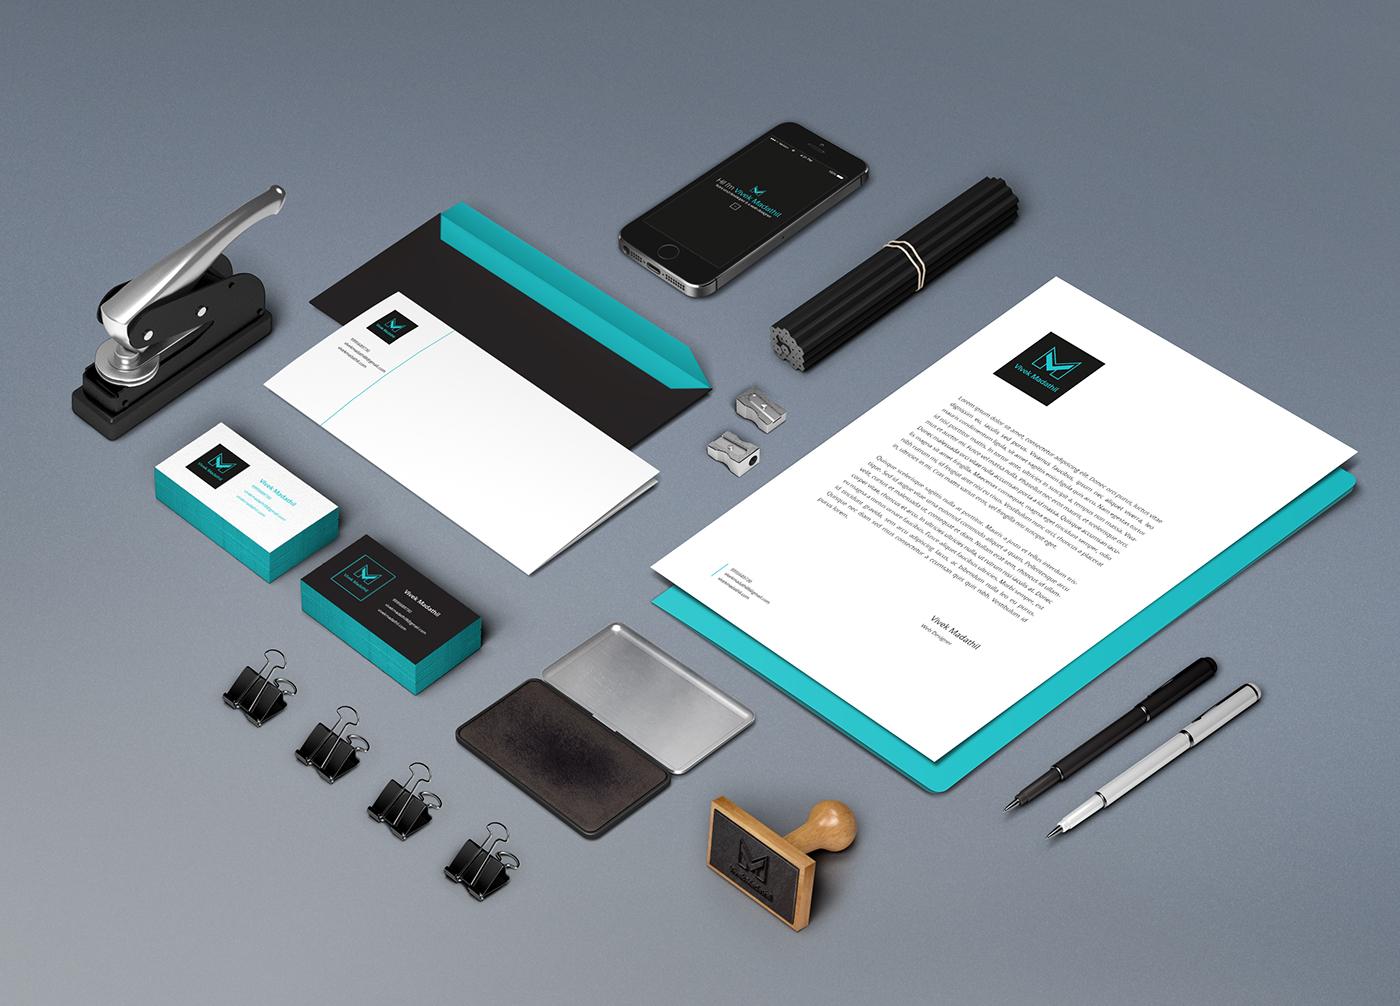 vivekmadathil vivek madathil logo brand Webdesign Web Design  Vlogo mlogo vivek madathil